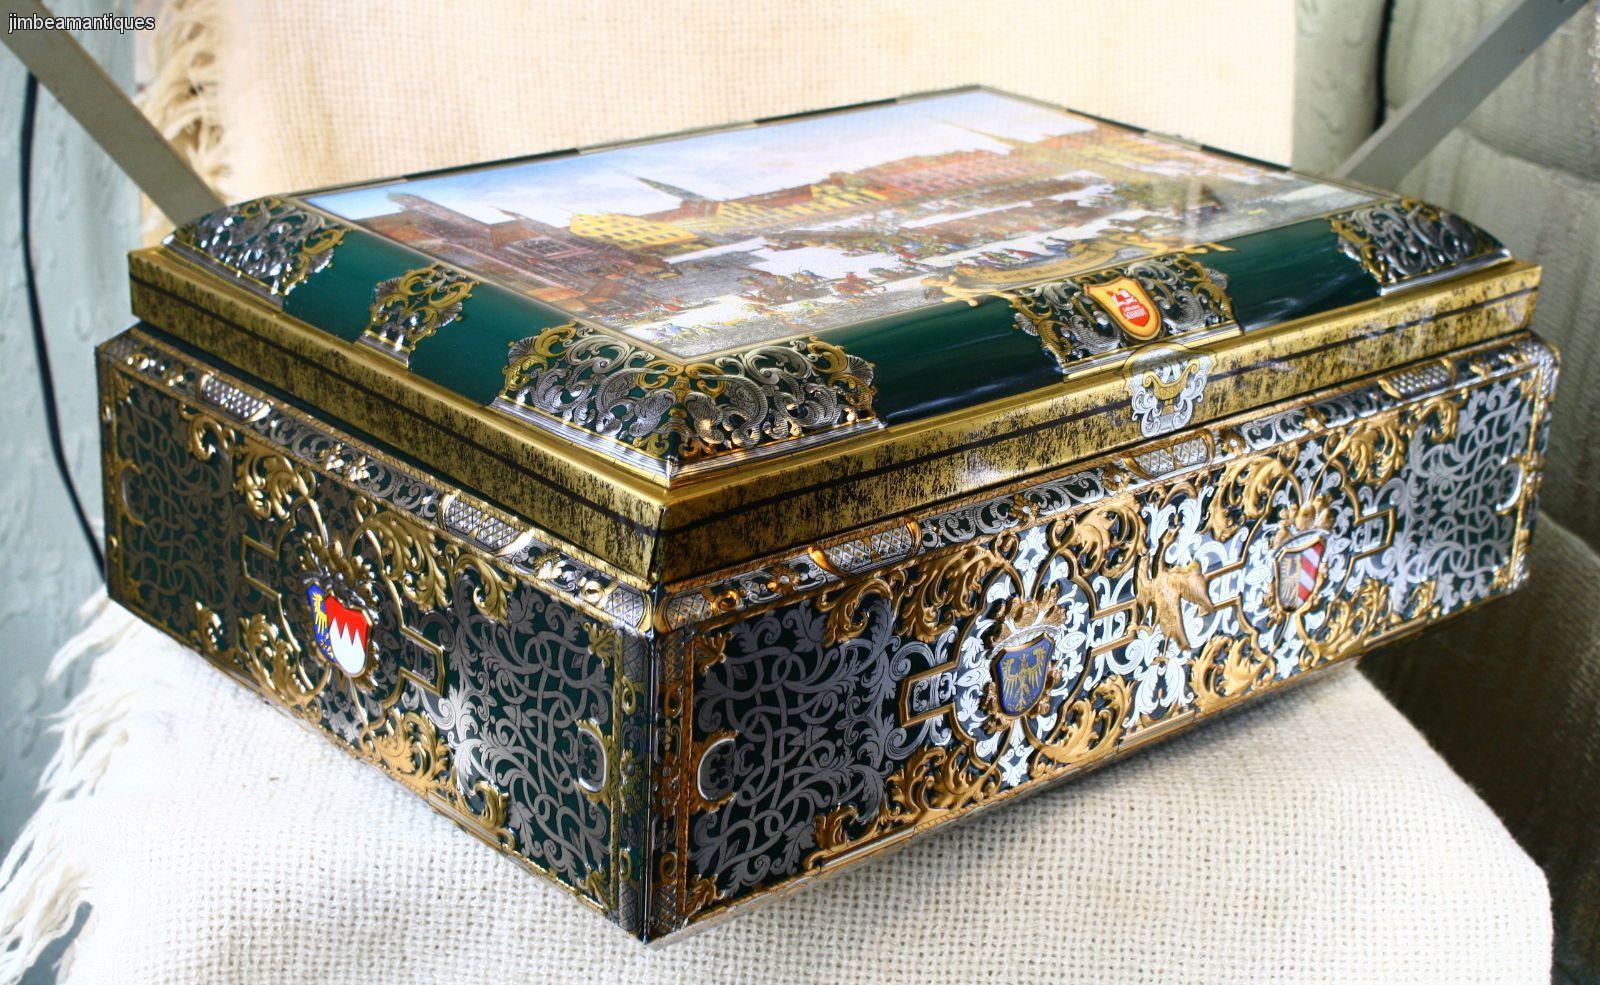 nurnberg germany lebkuchen schmidt large collectible cookie tin chest box 42cm ebay. Black Bedroom Furniture Sets. Home Design Ideas